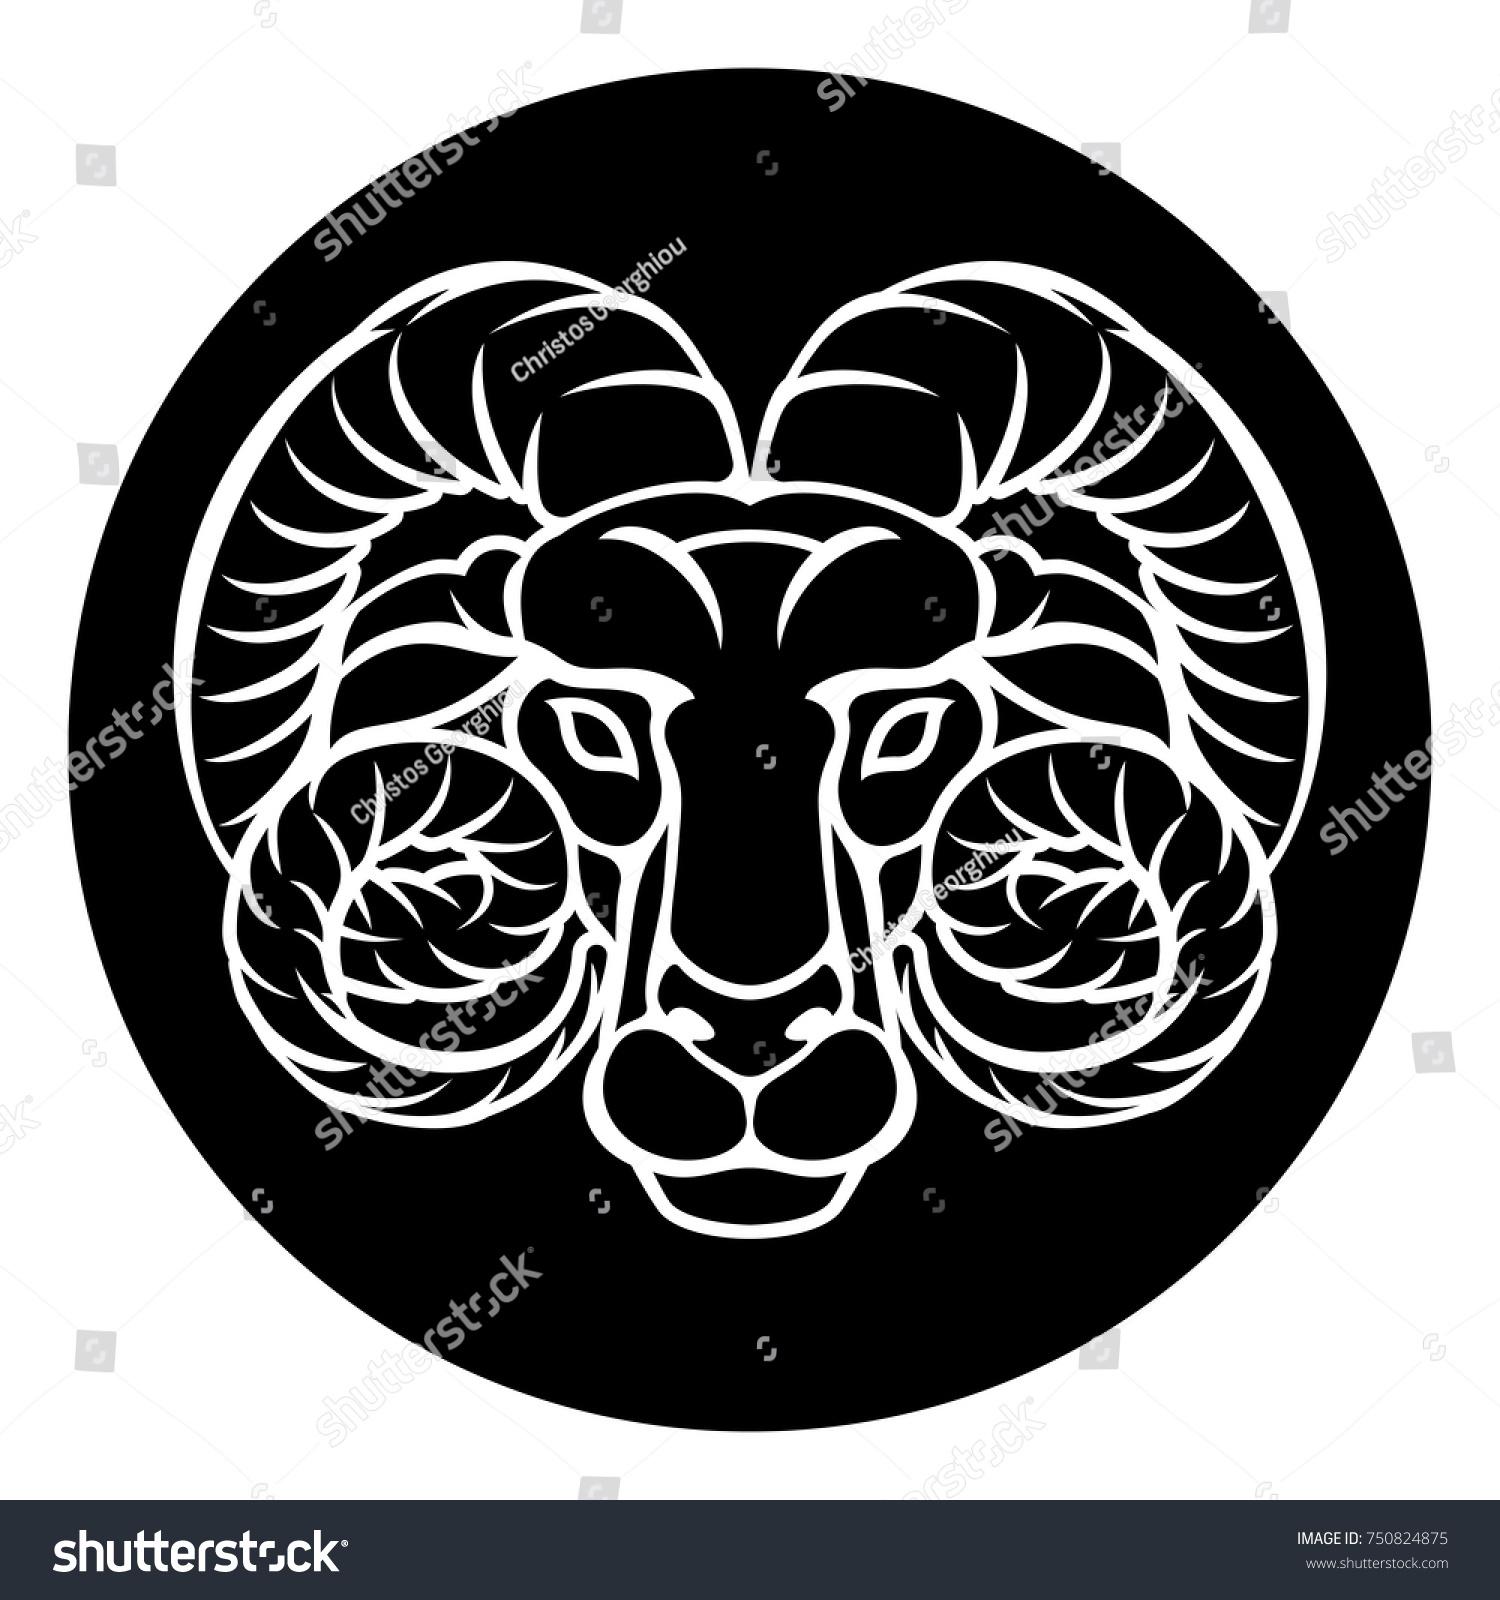 Aries Ram Horoscope Astrology Zodiac Sign Stock Vector Royalty Free